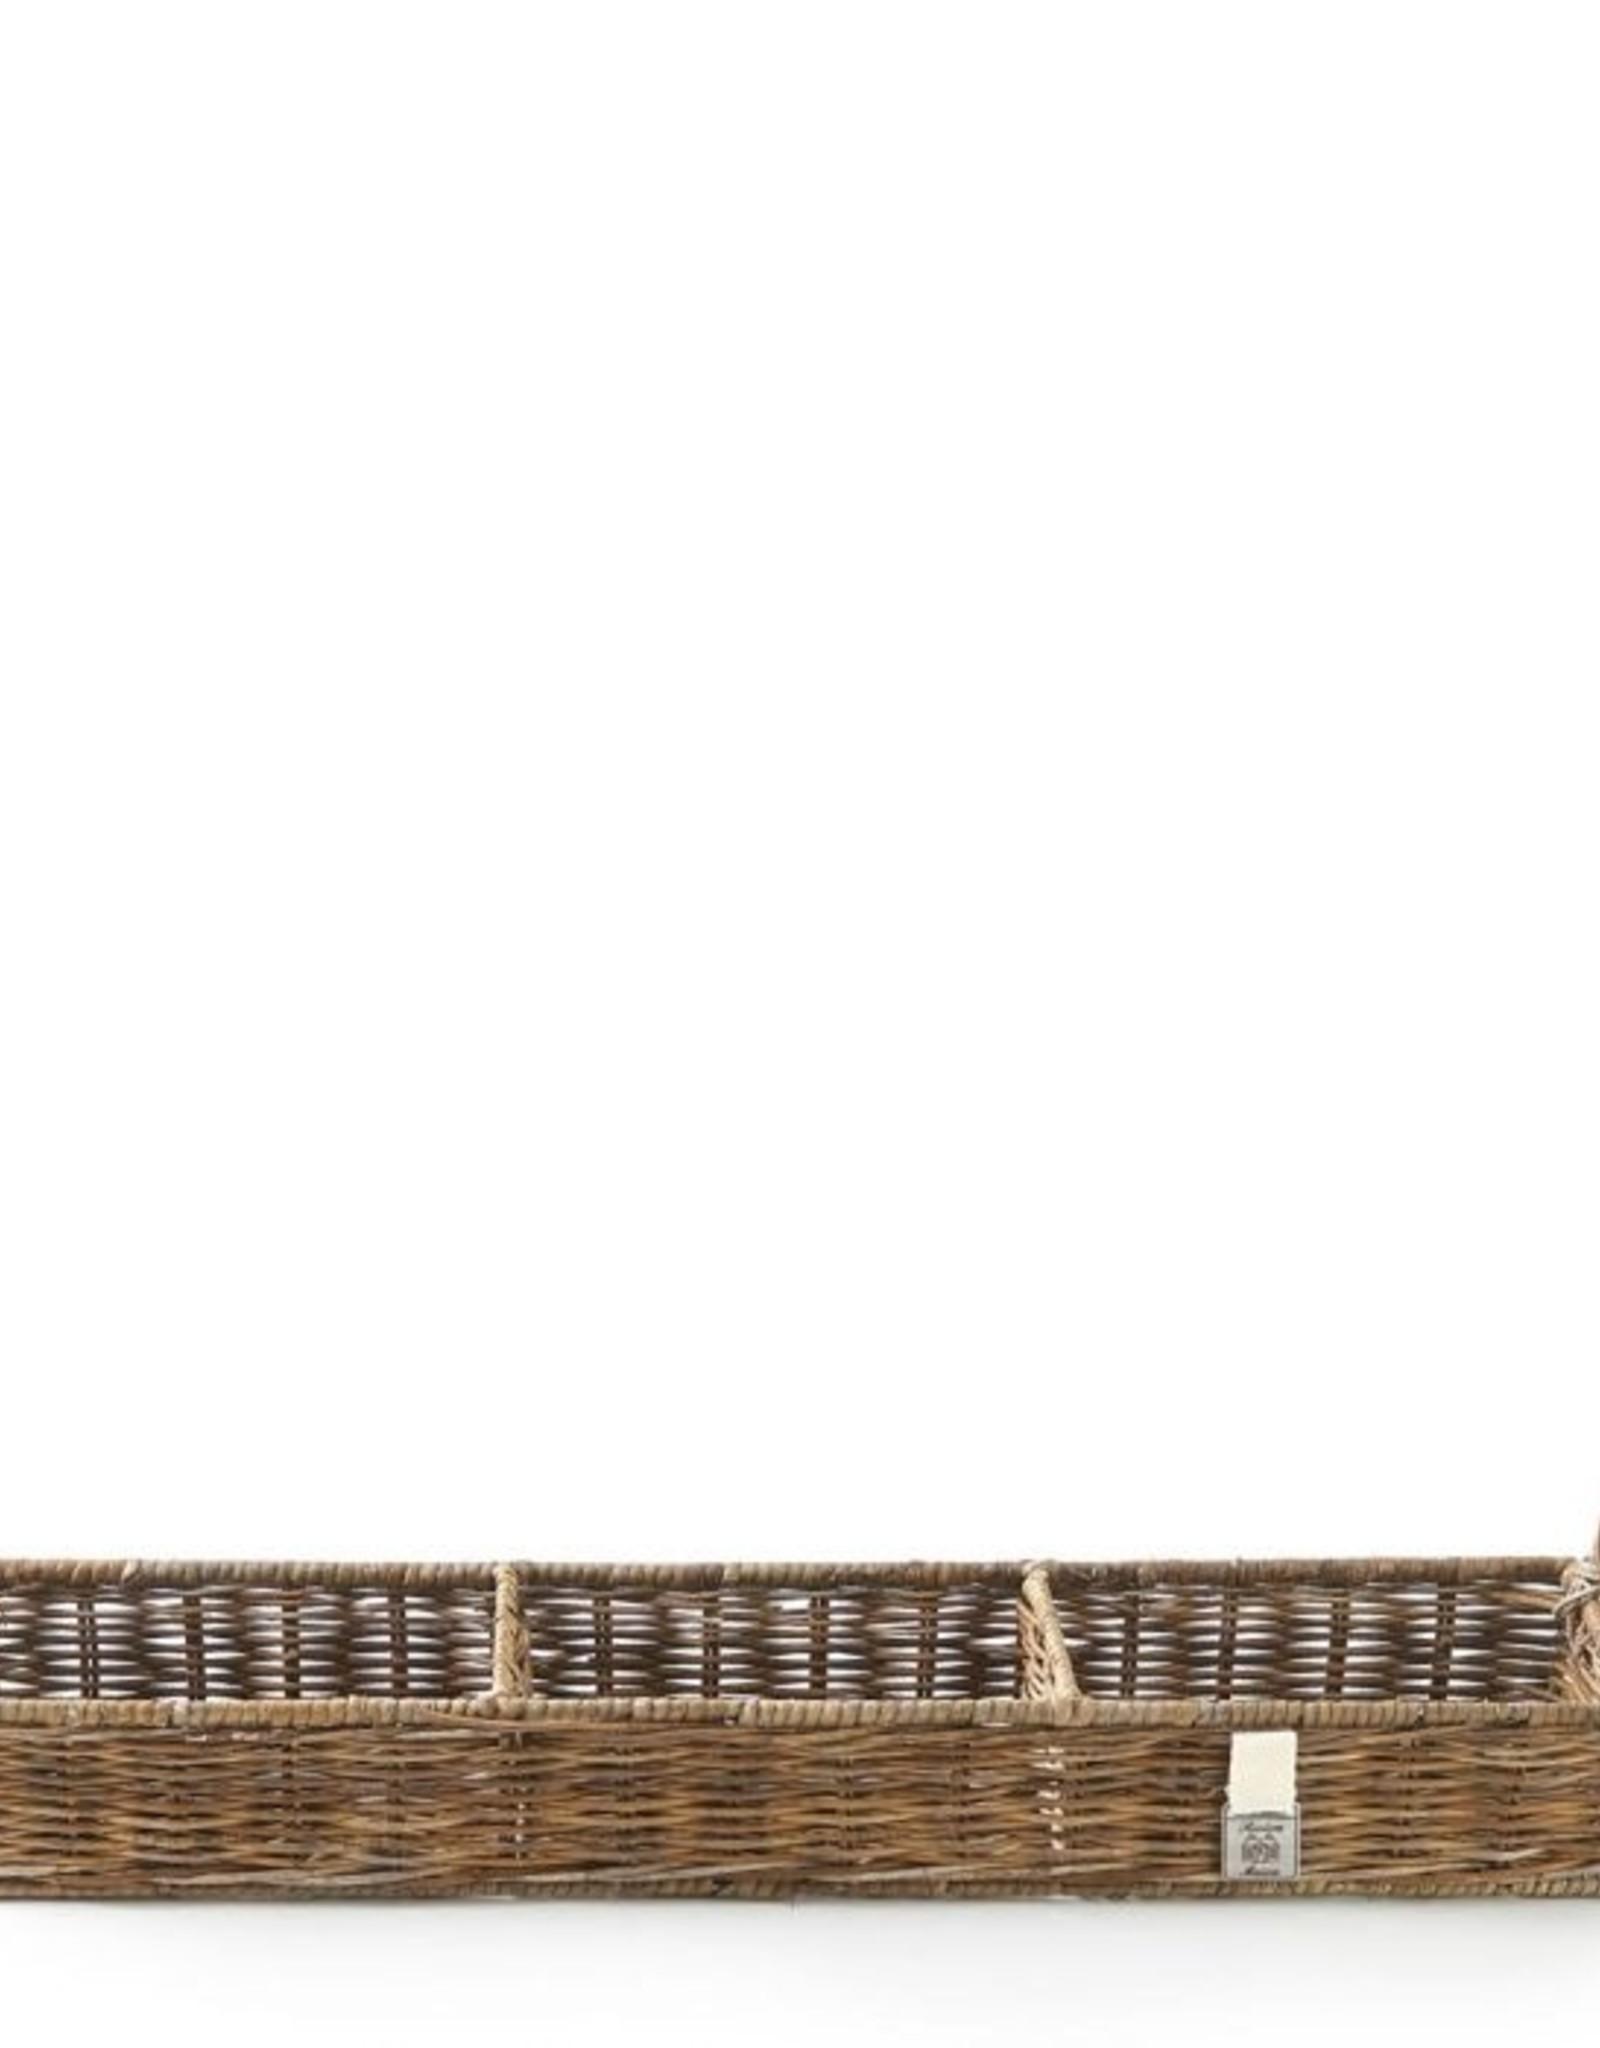 Riviera Maison Rustic Rattan Rectangular Basket